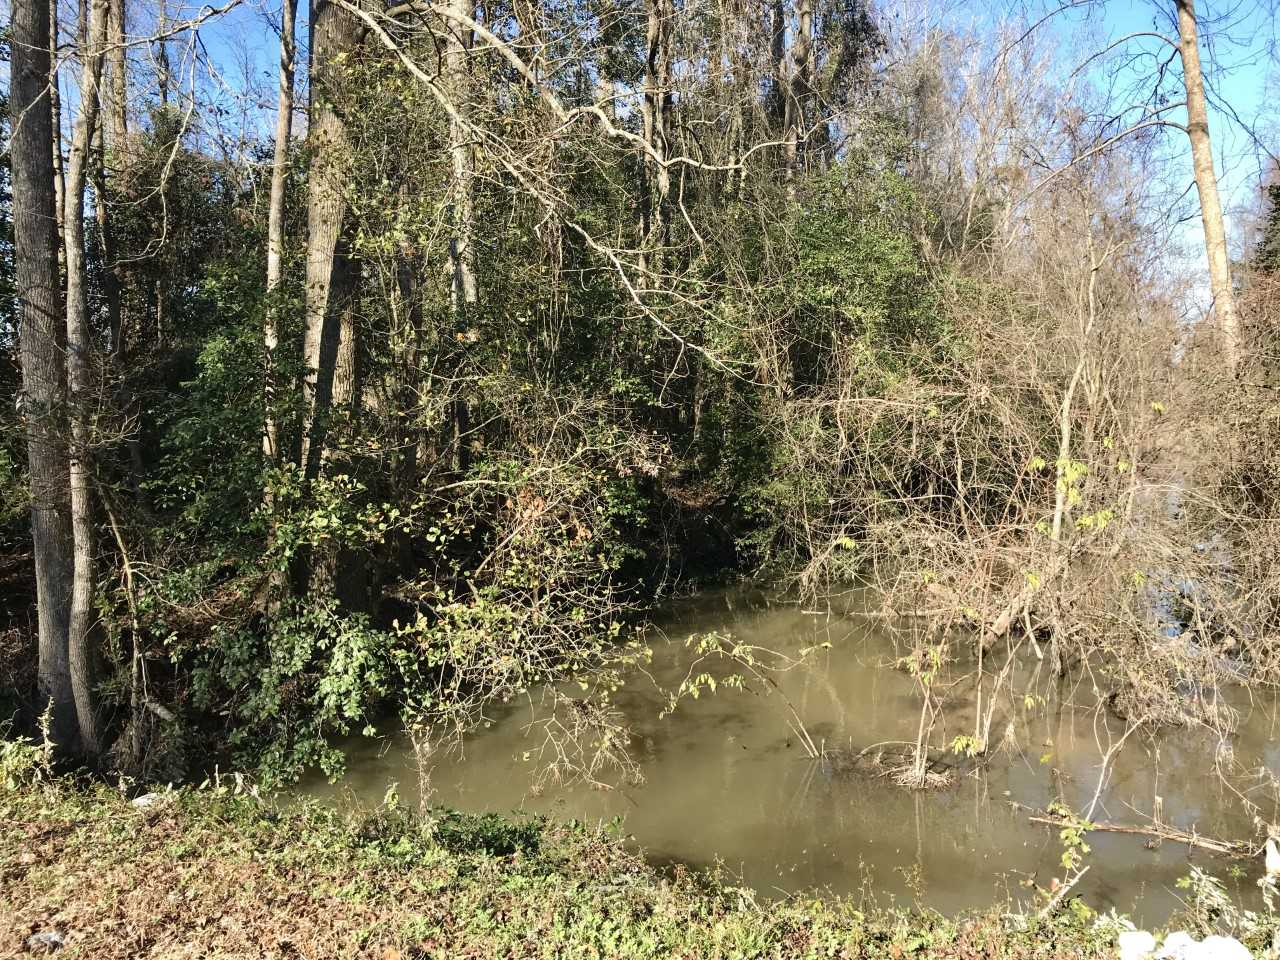 The swamp where Lauren was found dead (Photo: Russ Bowen)